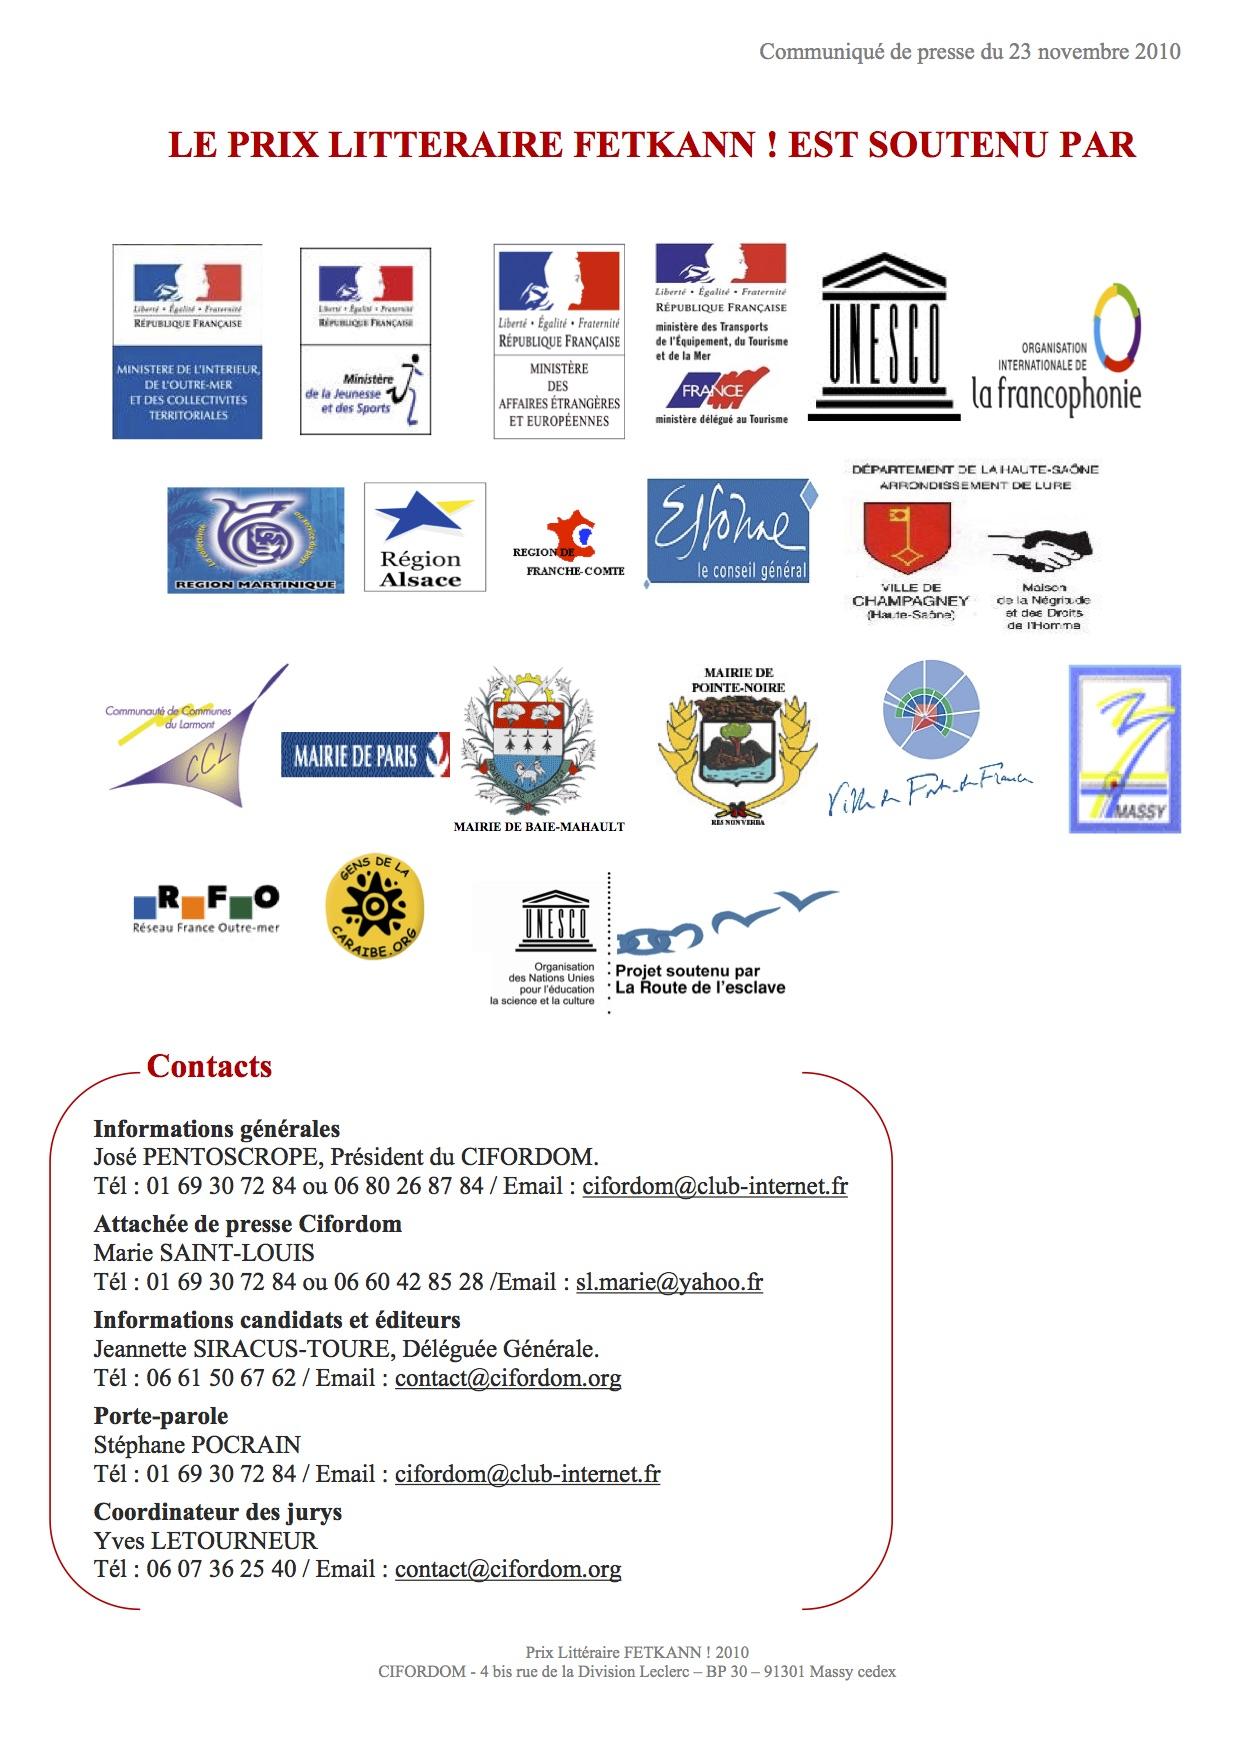 Communique_PRIX_FETKANN_2010_LES_PRESSENTIS-2